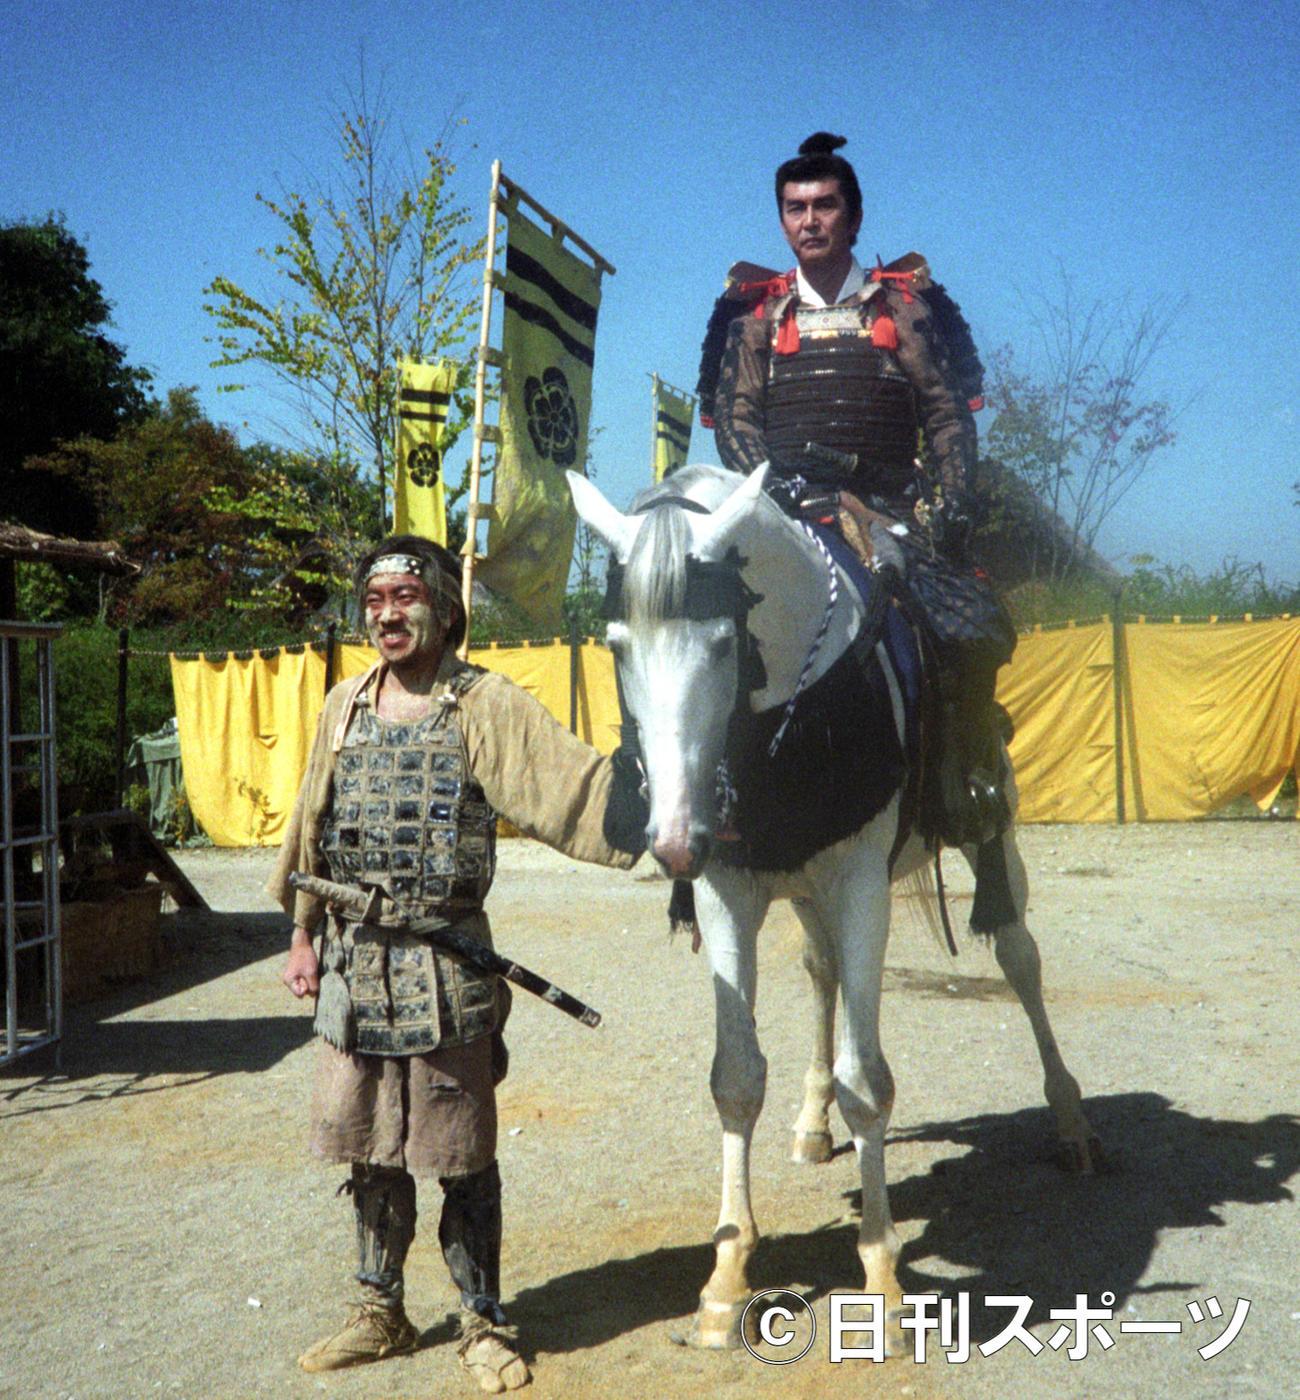 NHK「秀吉」収録でよろい姿で信長を演じる渡哲也さんと、秀吉役の竹中直人(1995年9月22日撮影)